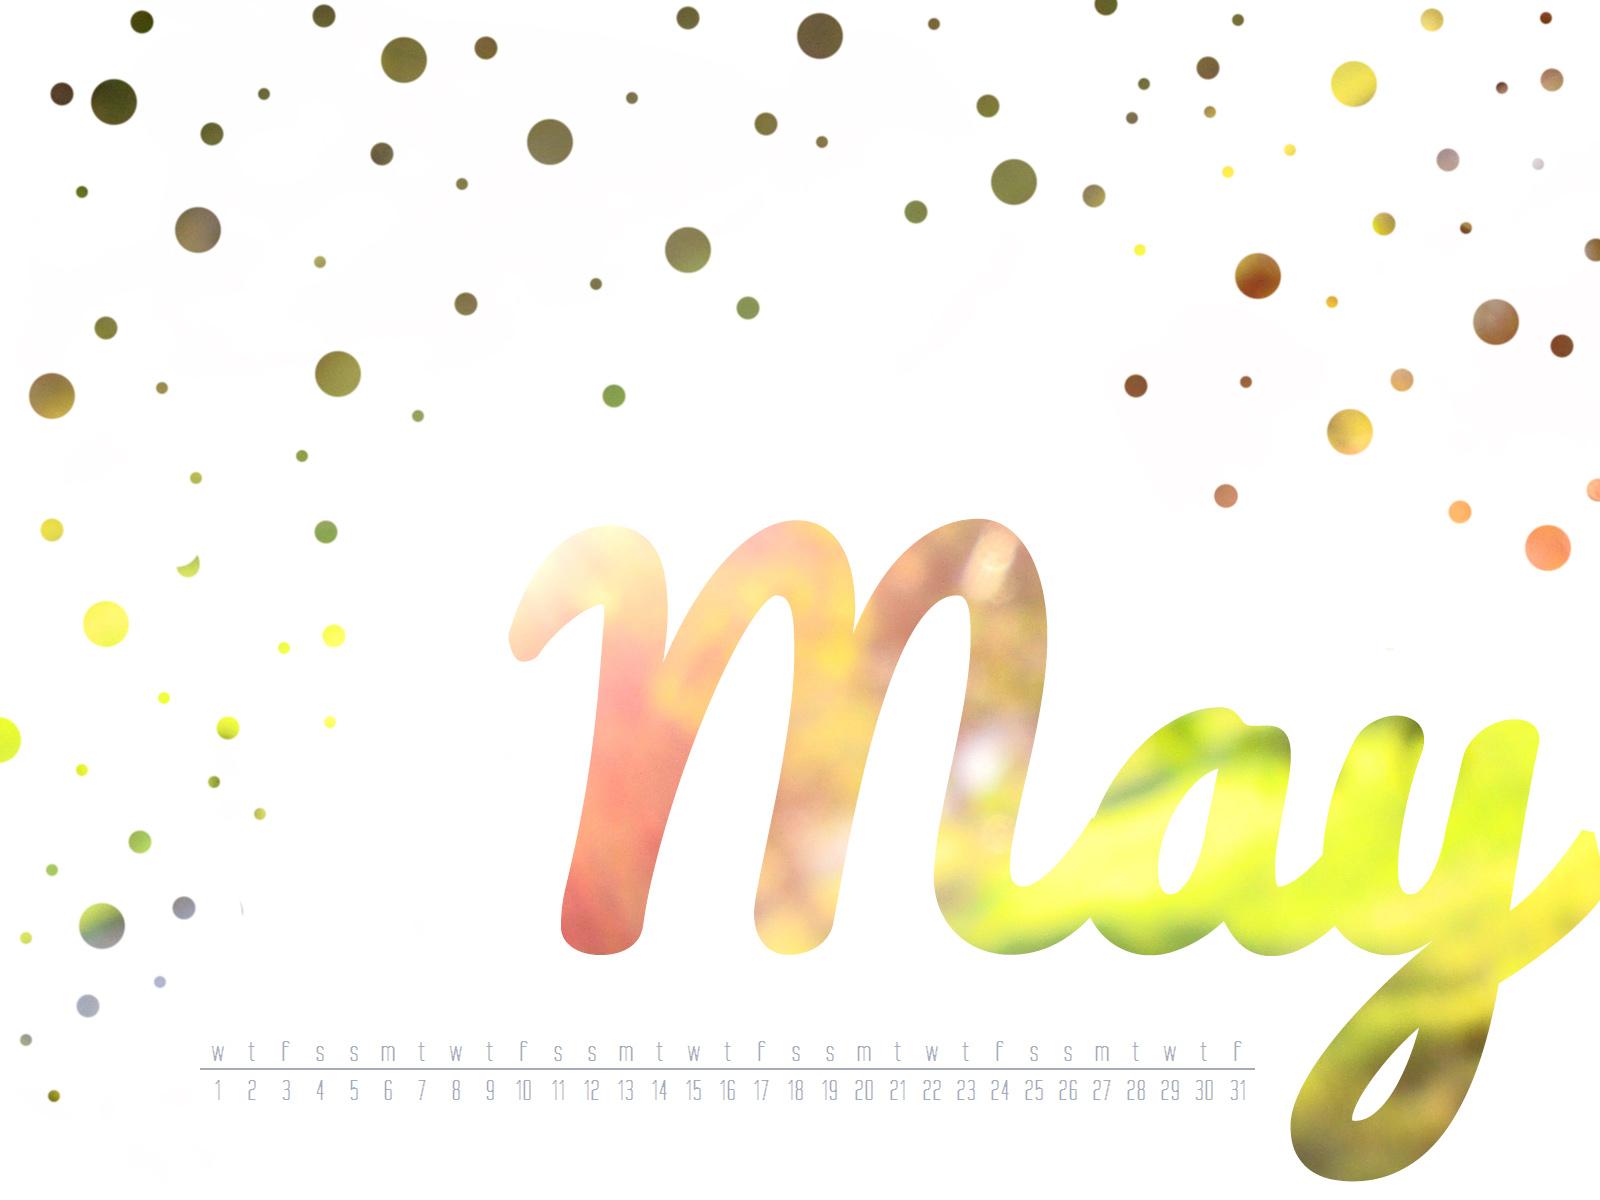 May Desktop Wallpaper   OneThreadThatWinds 1600x1200